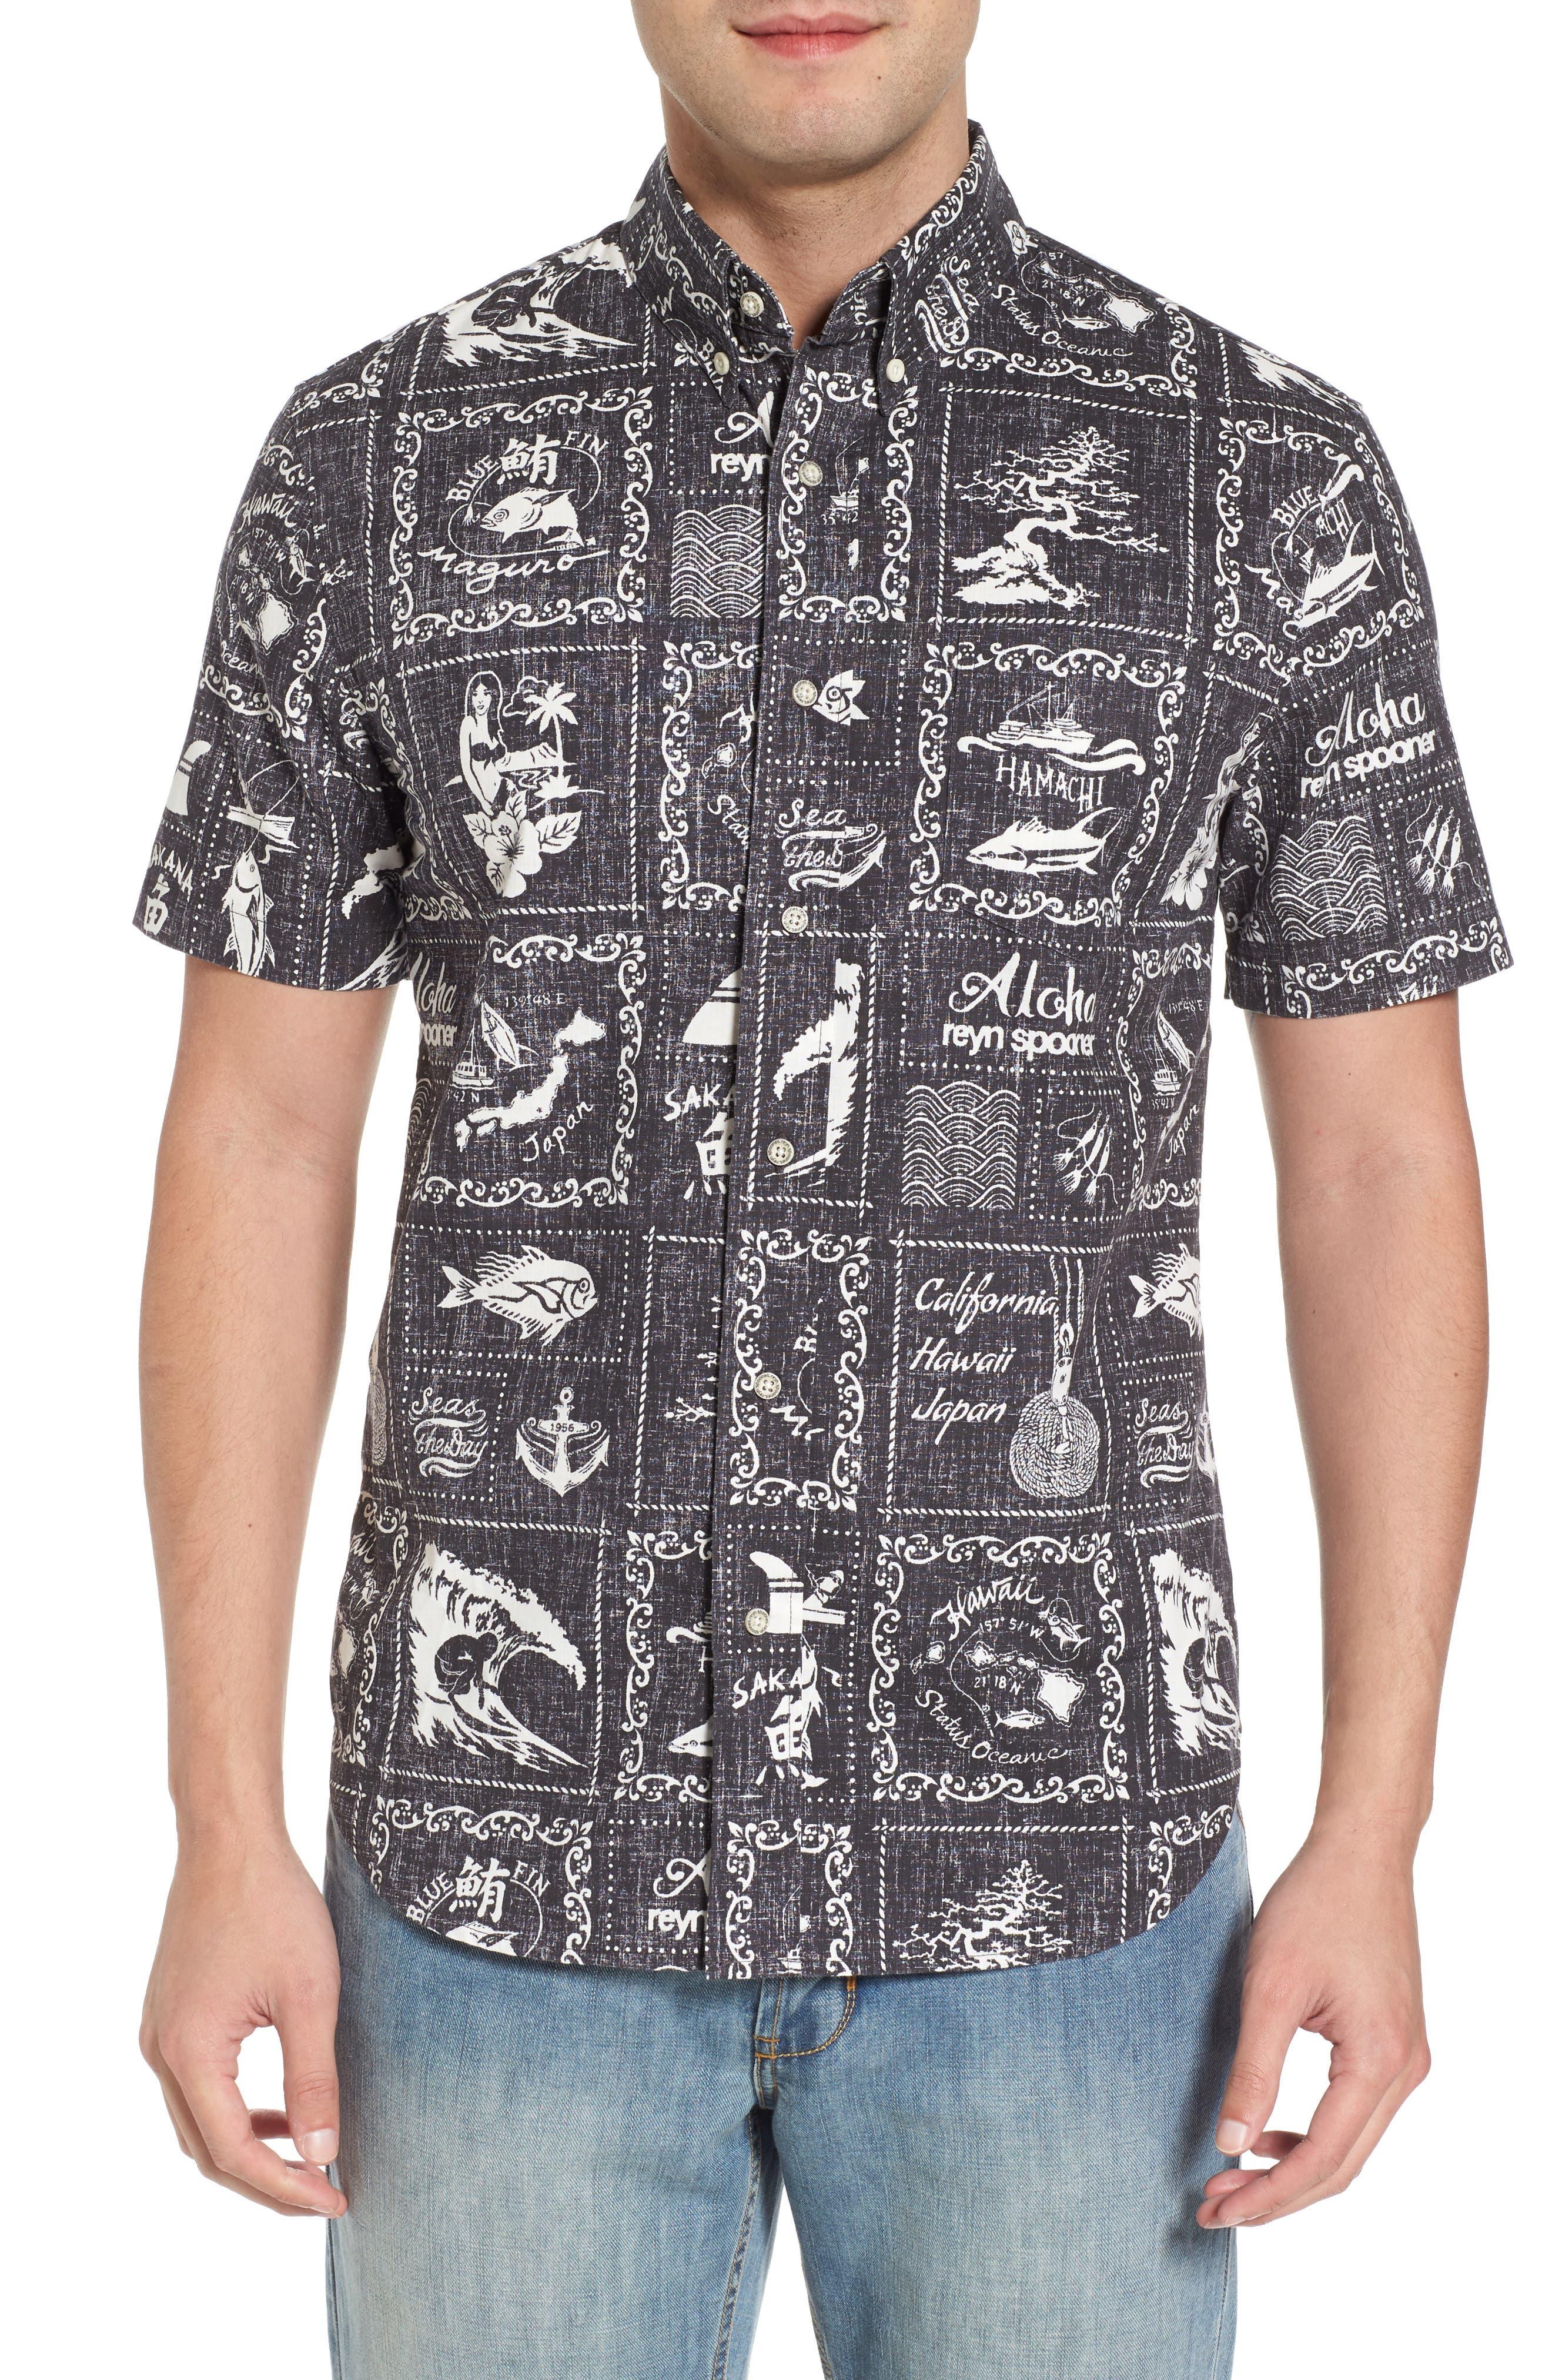 Alternate Image 1 Selected - Reyn Spooner Stories from the East Regular Fit Sport Shirt